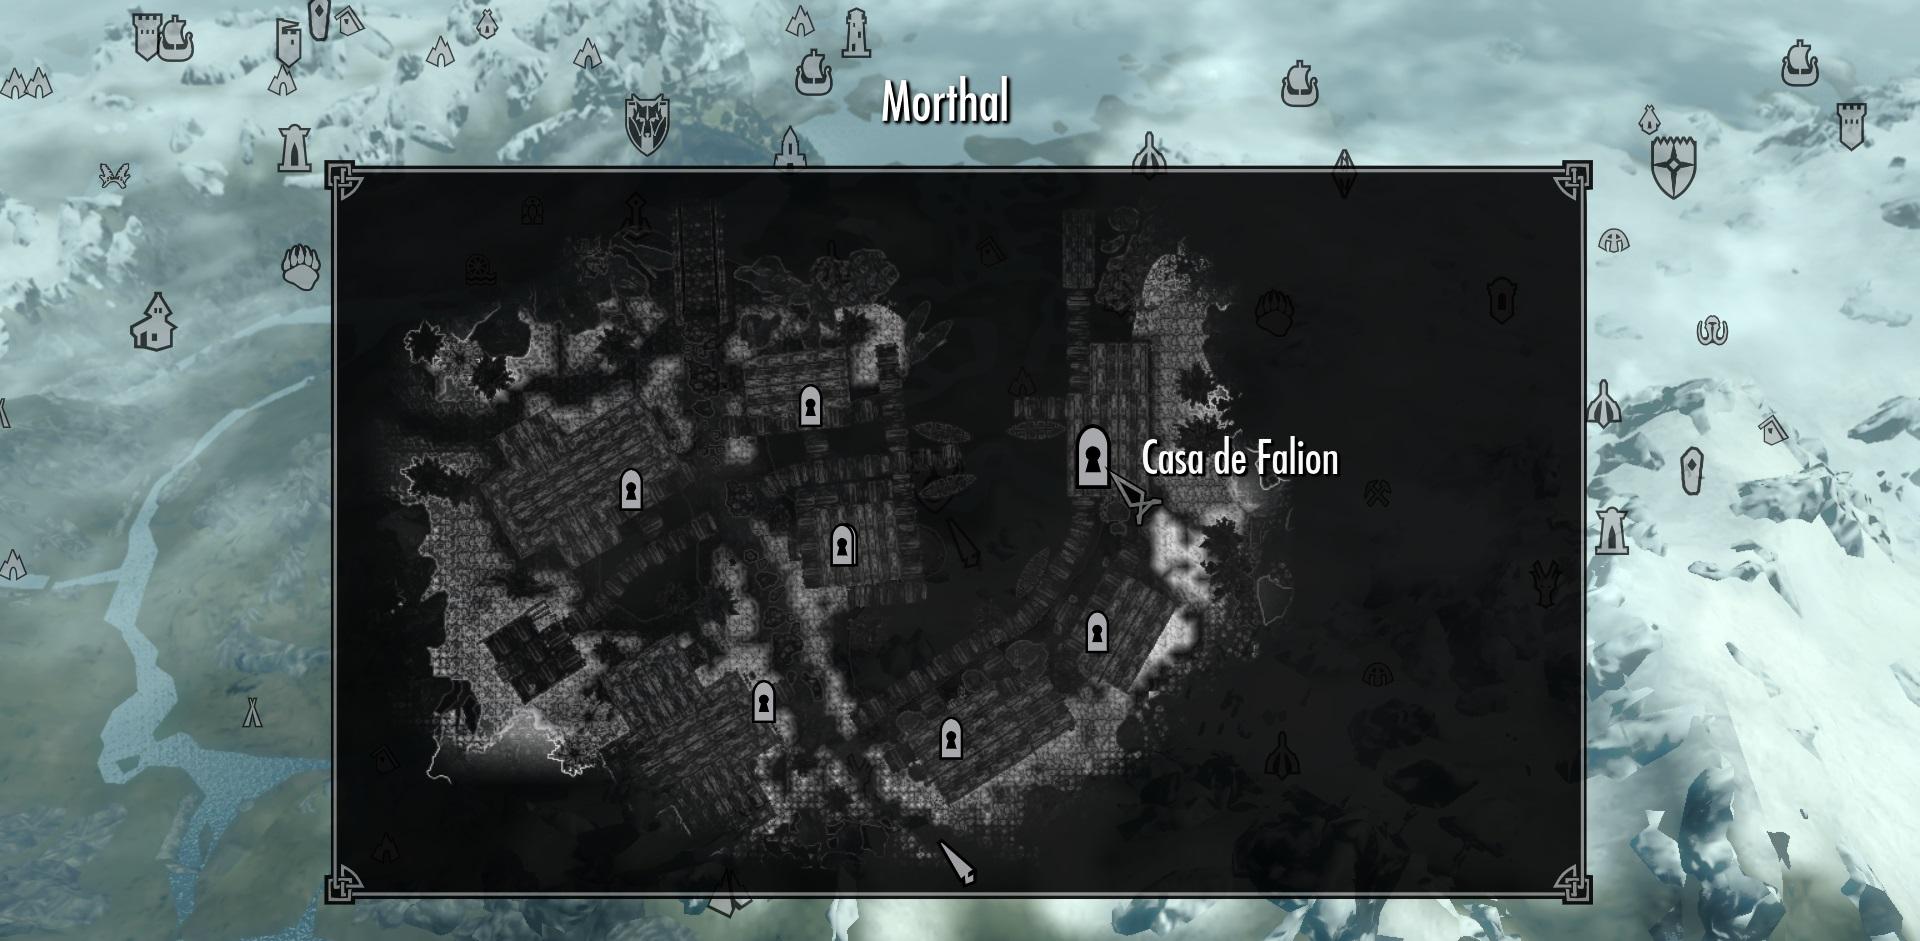 Casa de Falion